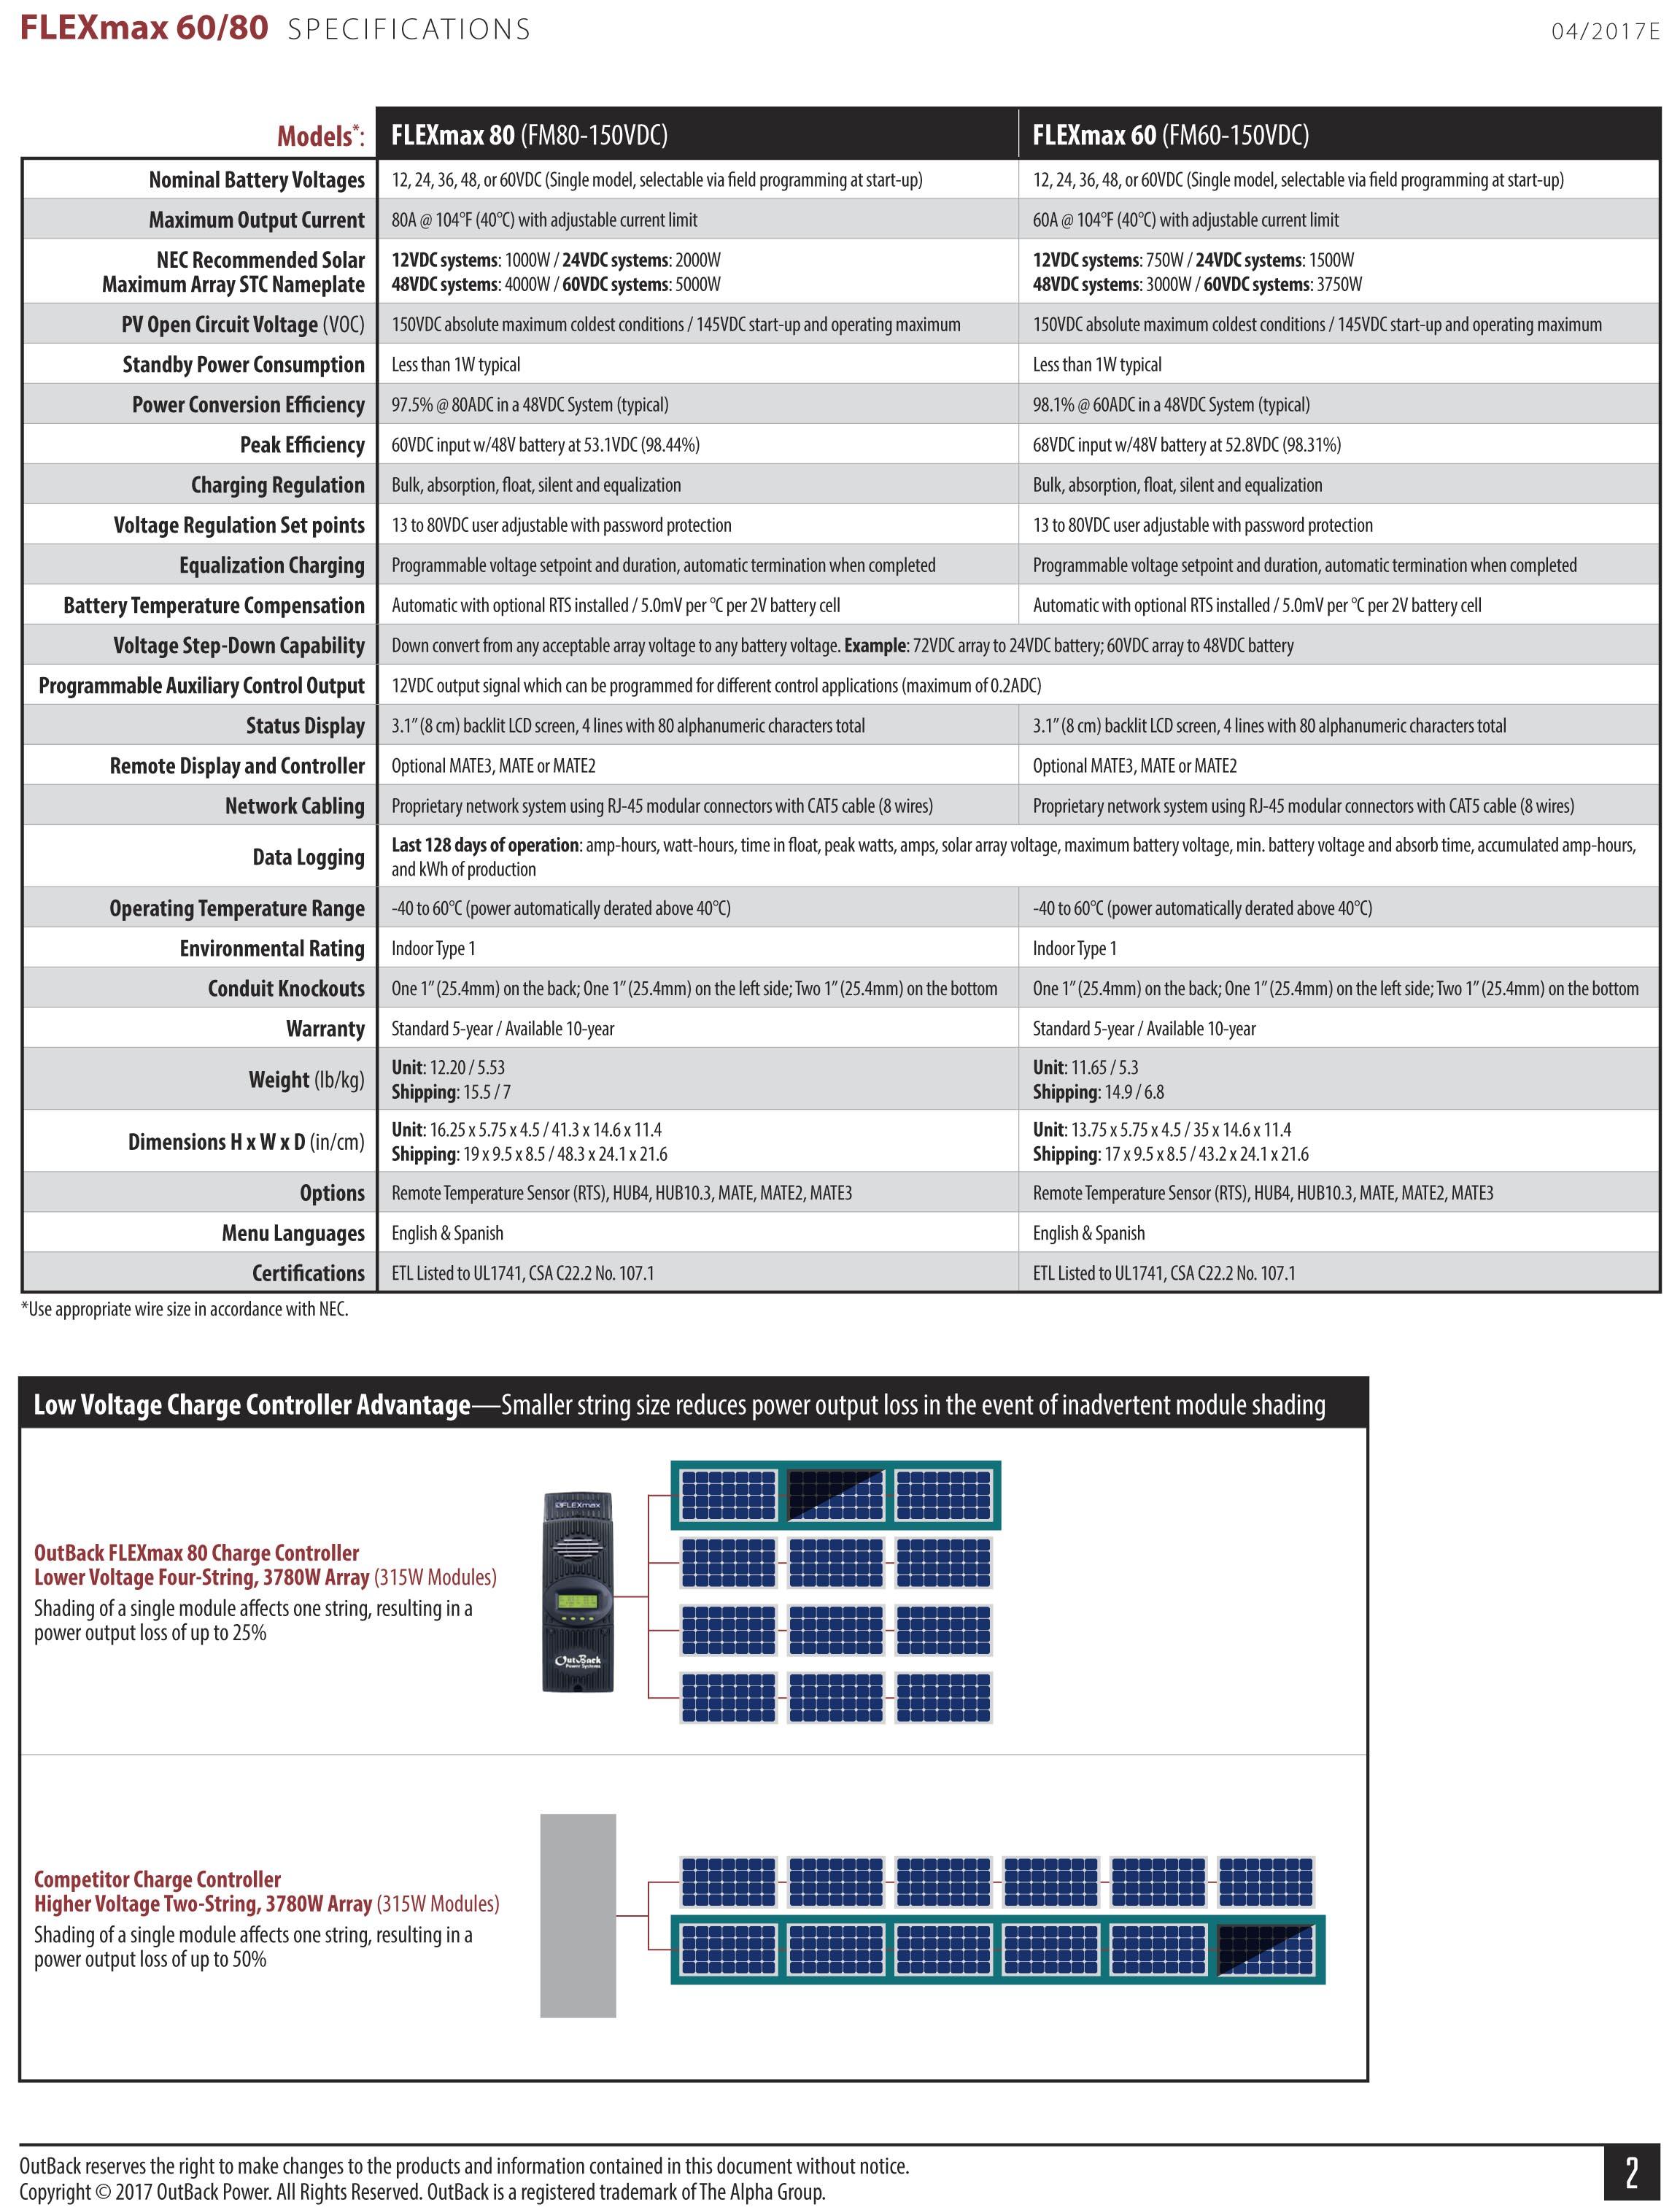 specsheetFM6080-2.jpg